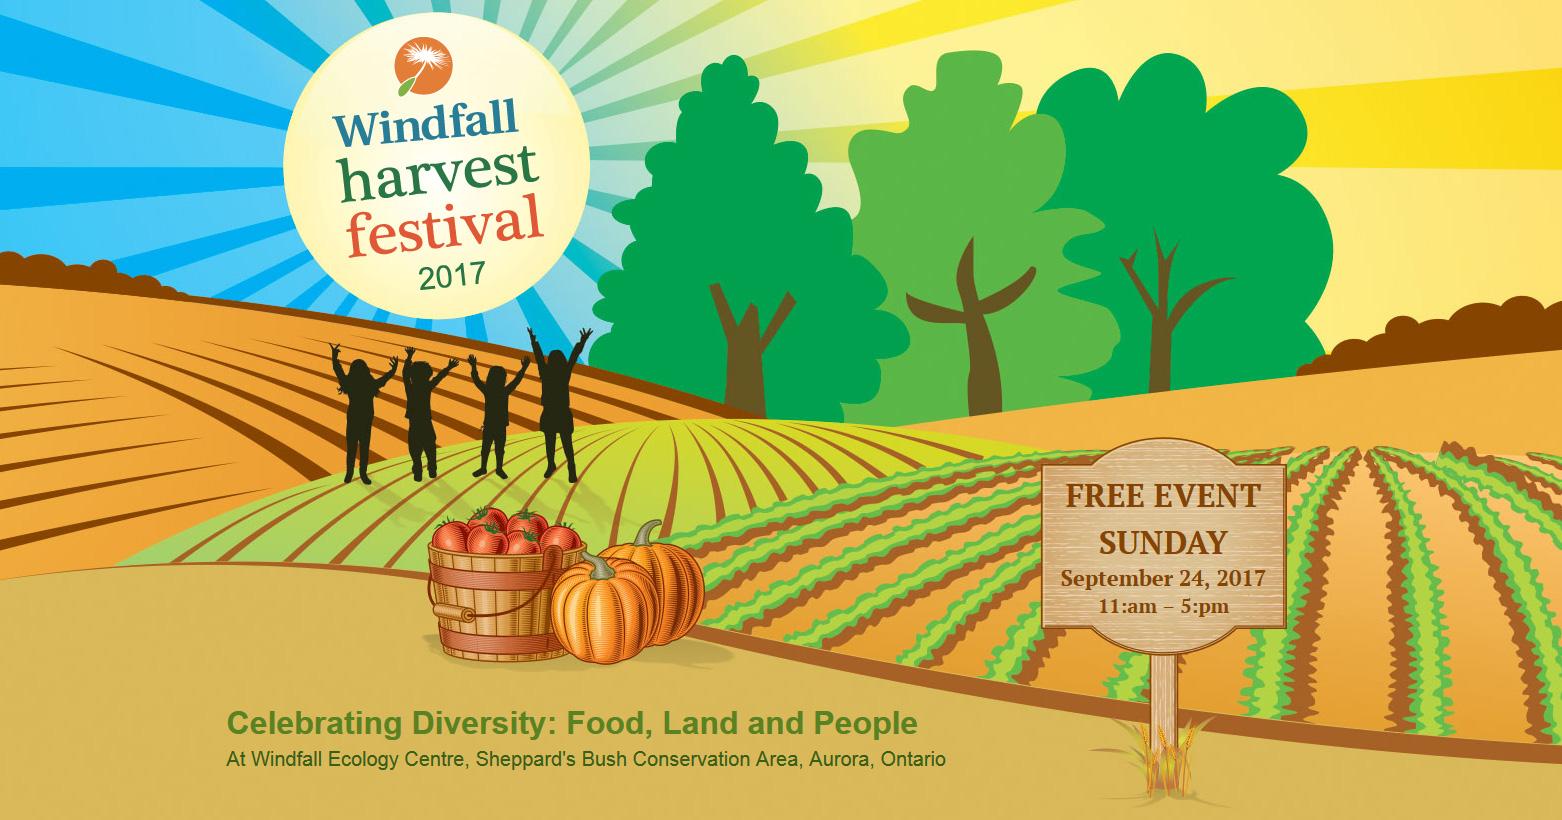 Windfall Harvest Festival